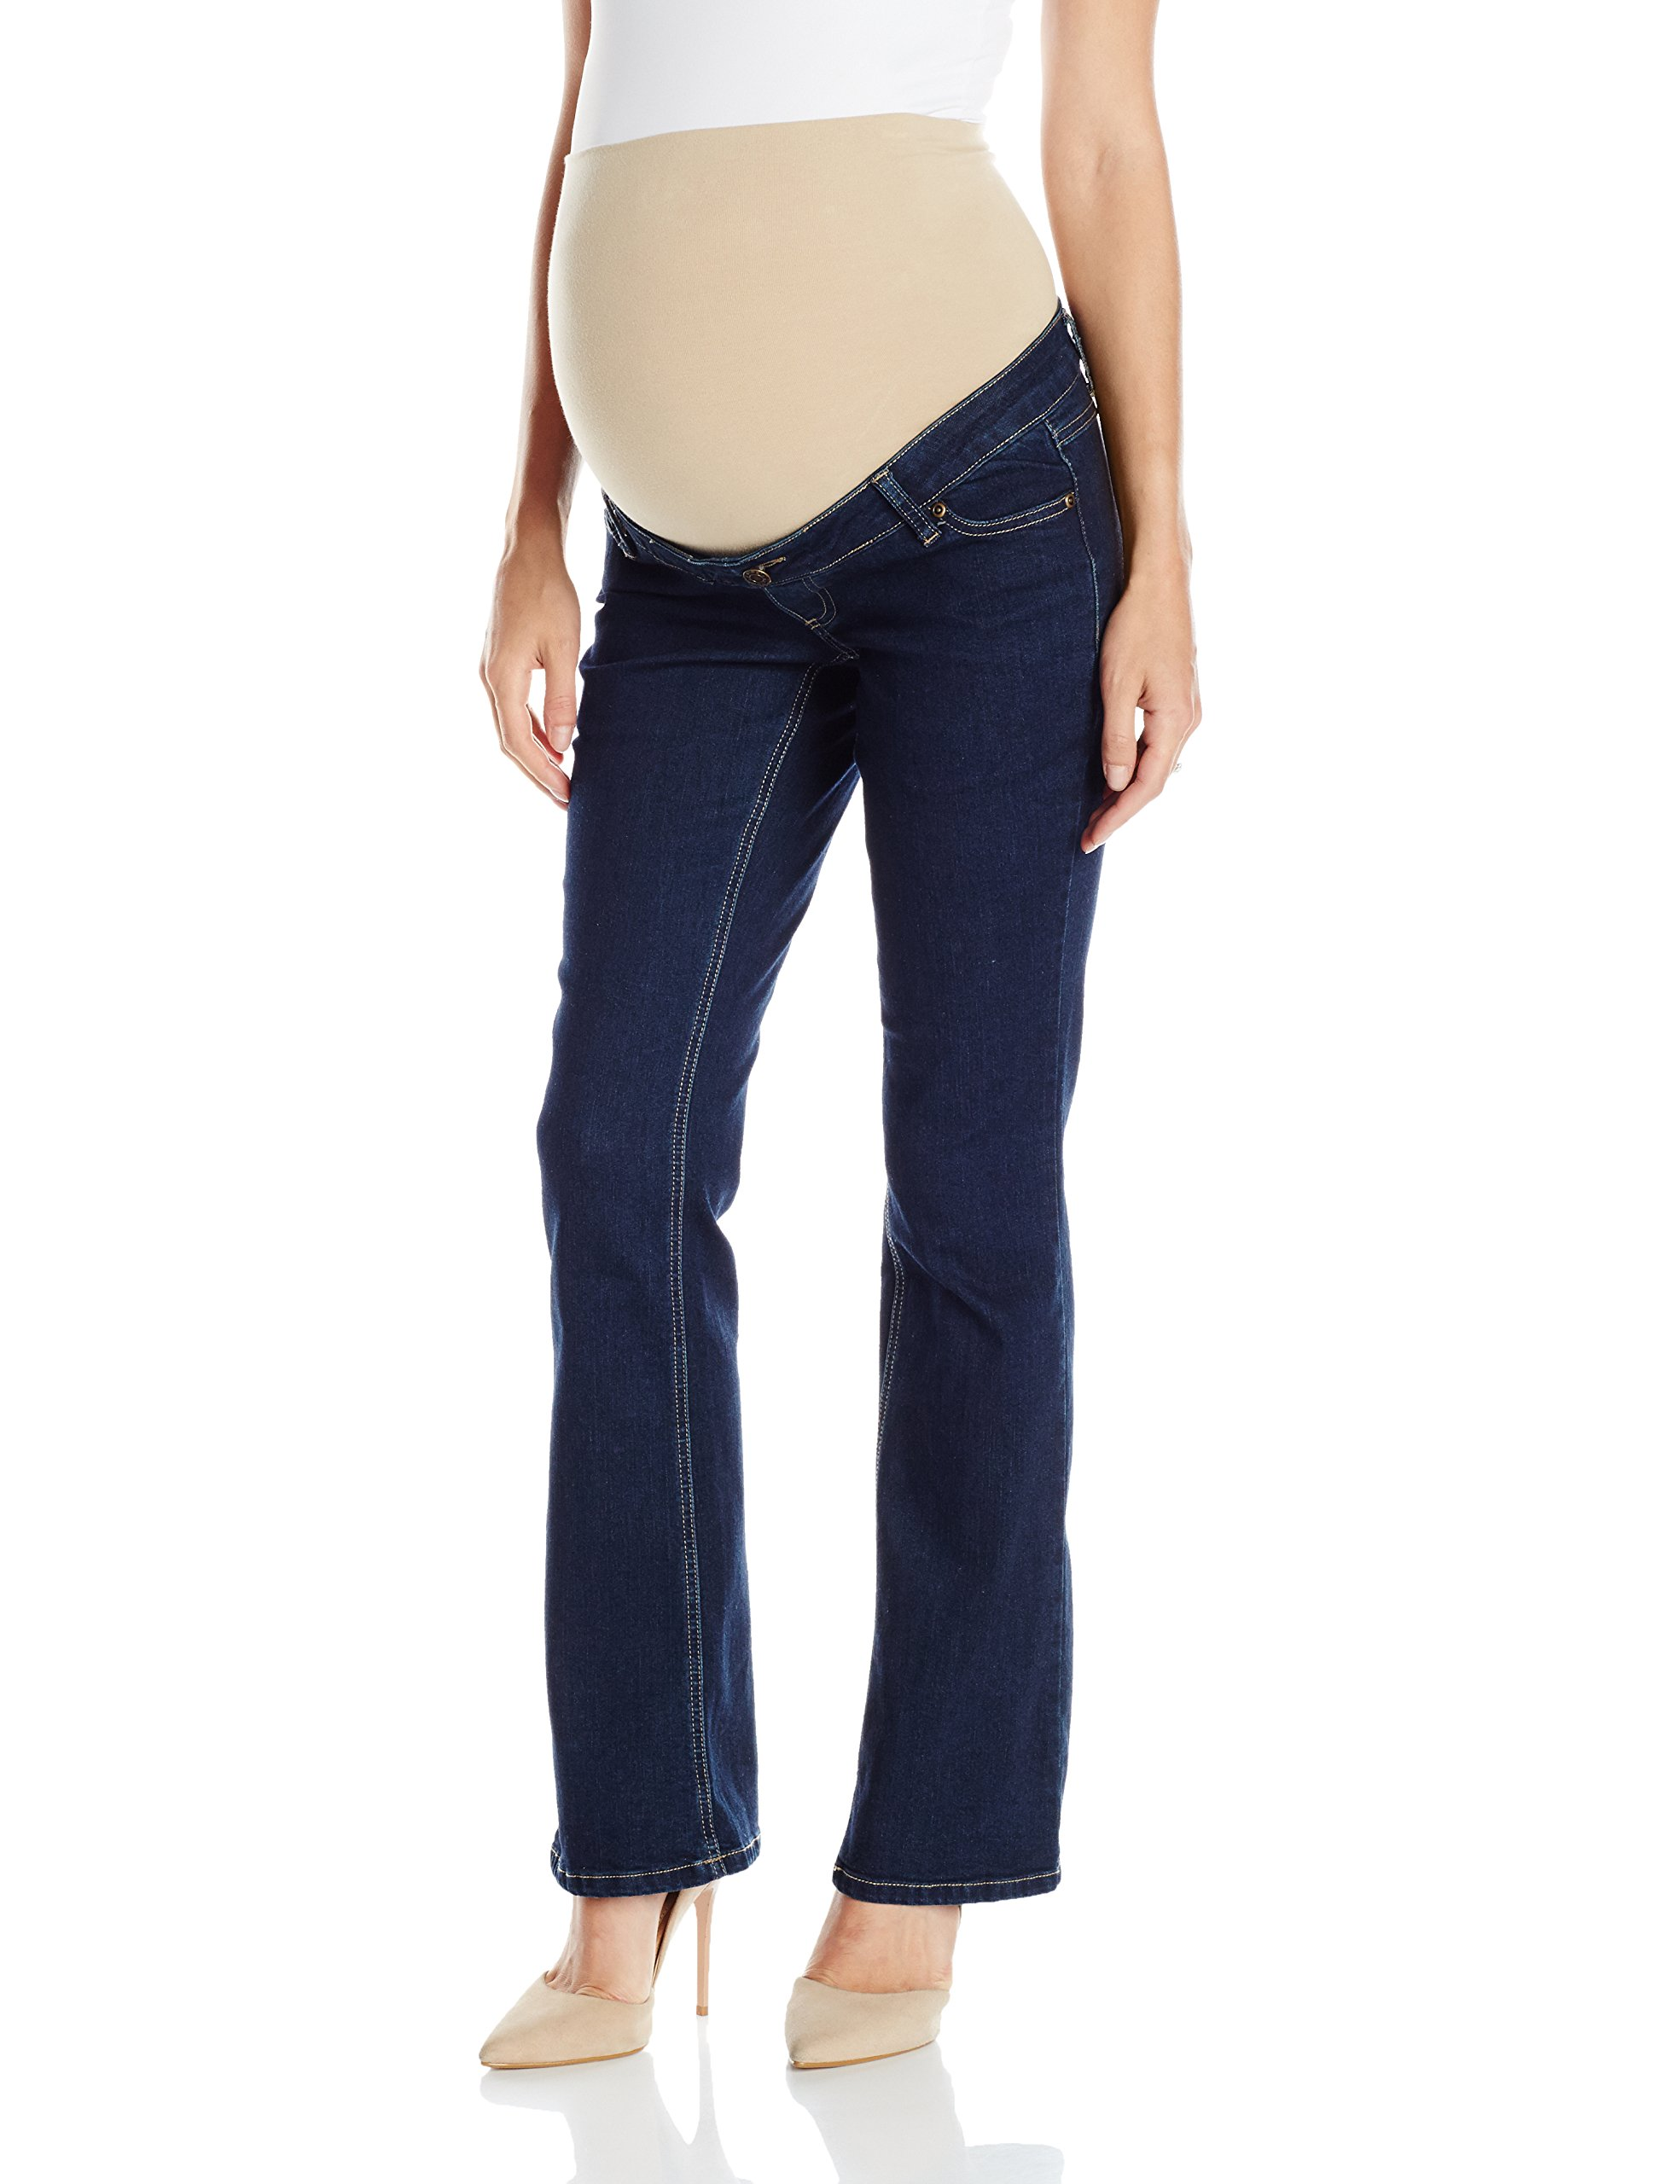 Three Seasons Maternity Women's Maternity Denim Flare Jean with Natural Bellie Band, Dark Wash, Large